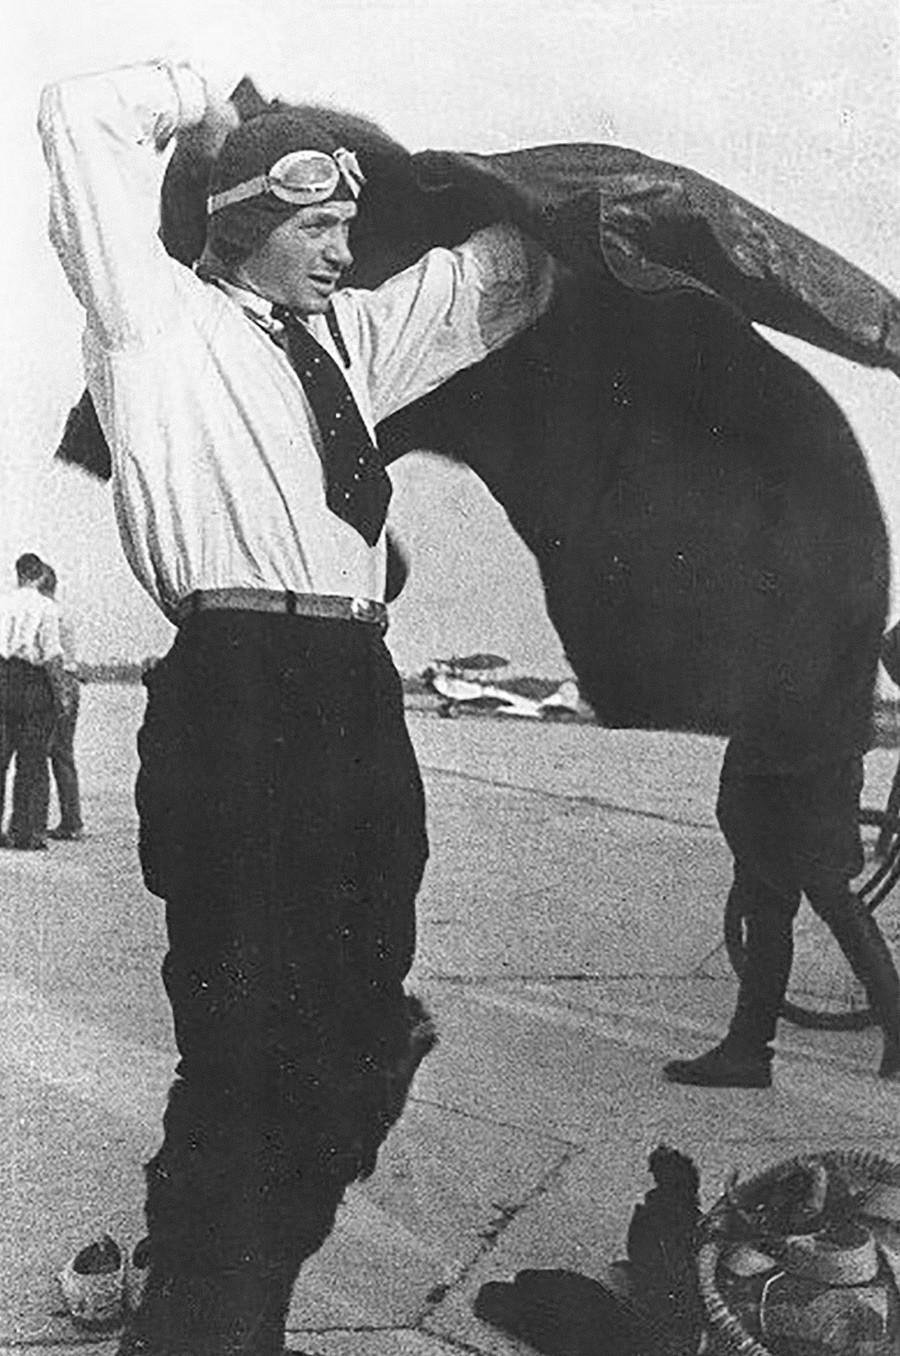 Pilote d'essai de Vladimir Kokkinaki avant un vol, années 1930